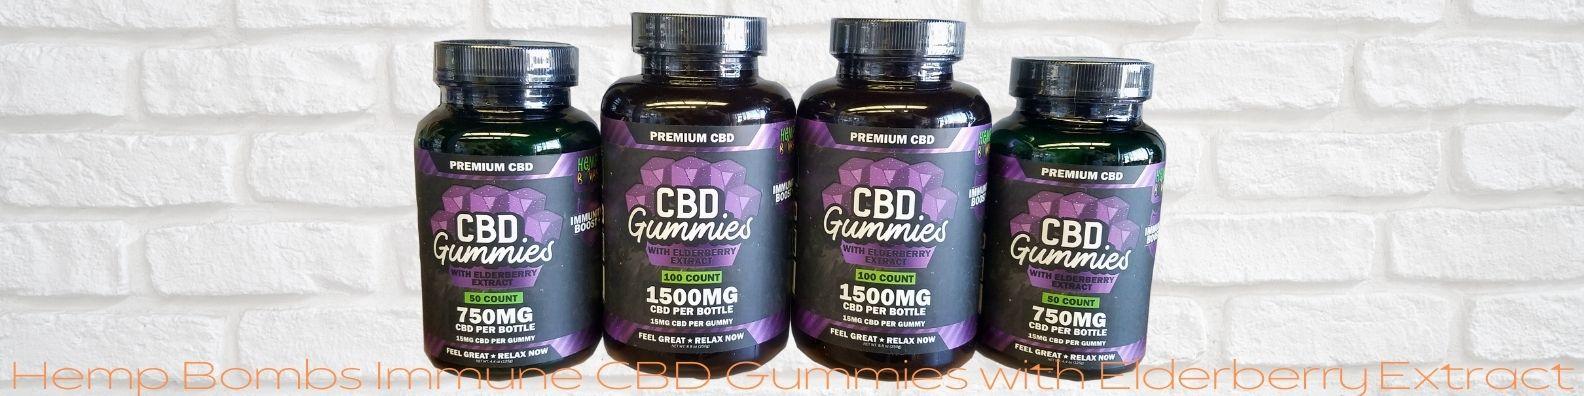 Hemp Bombs Immunity CBD Gummies with Elderberry Extract